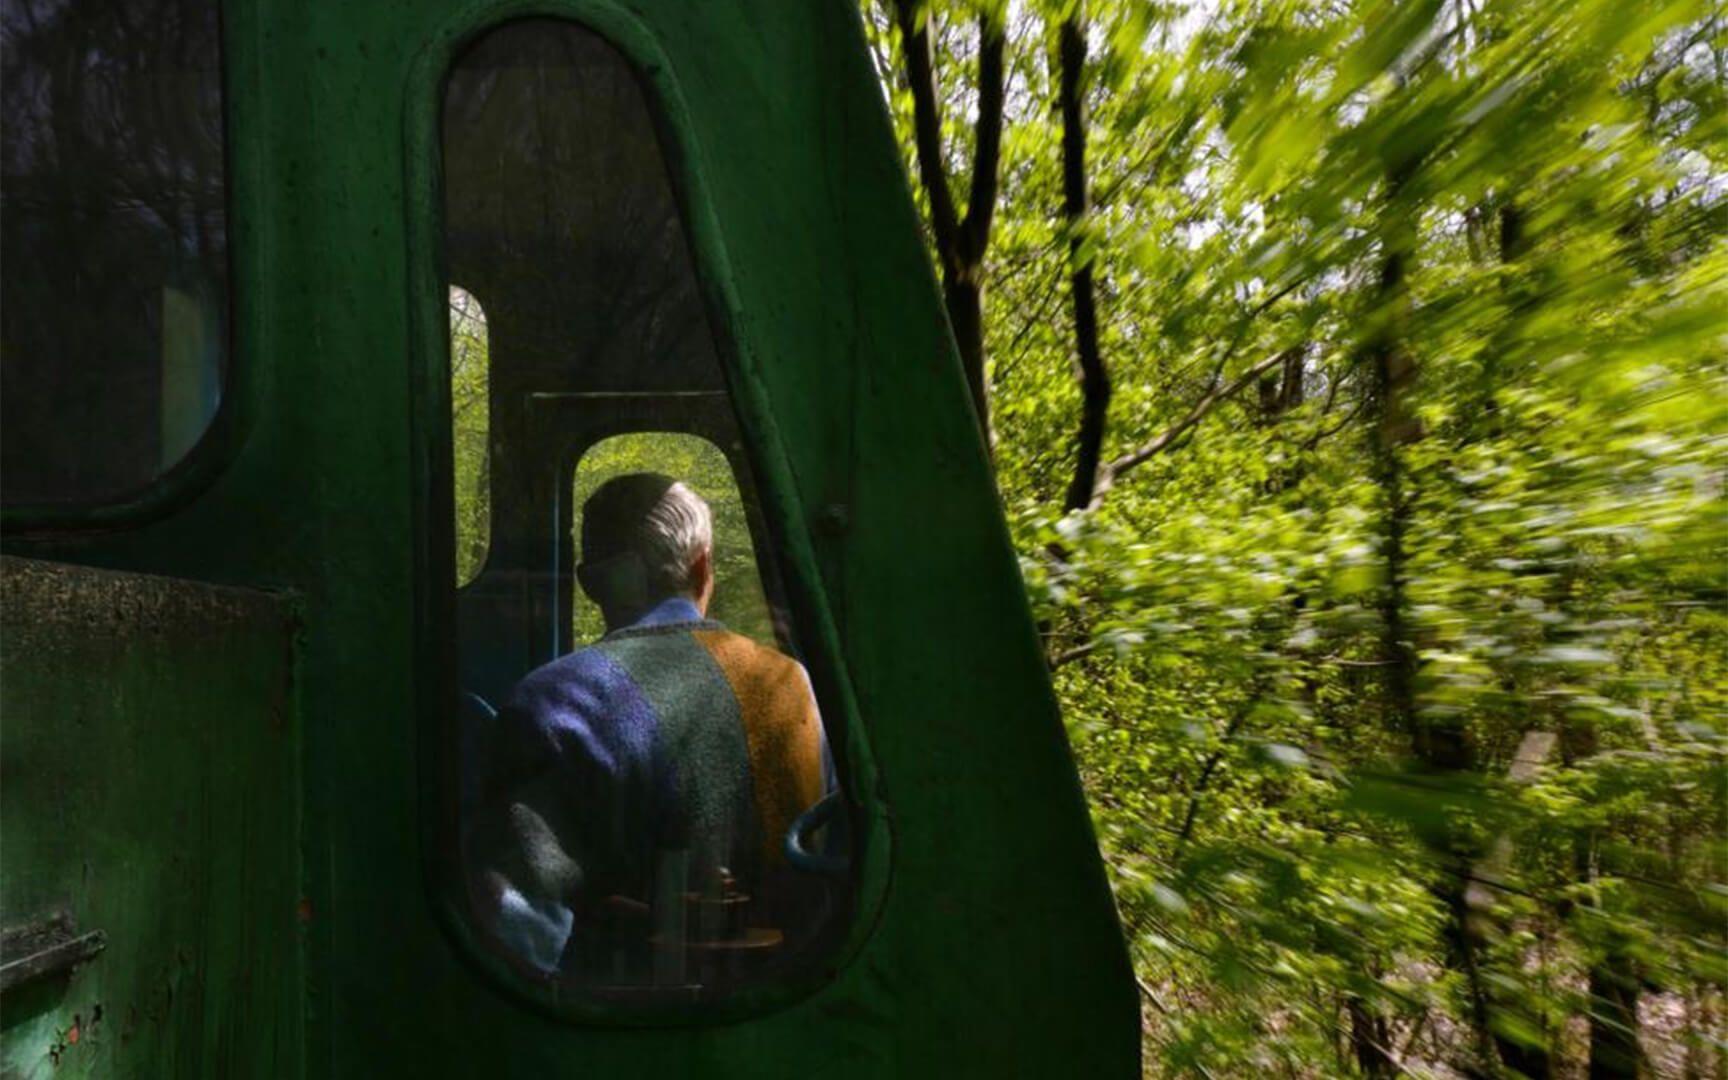 Ukraine Tunnel of Love 1